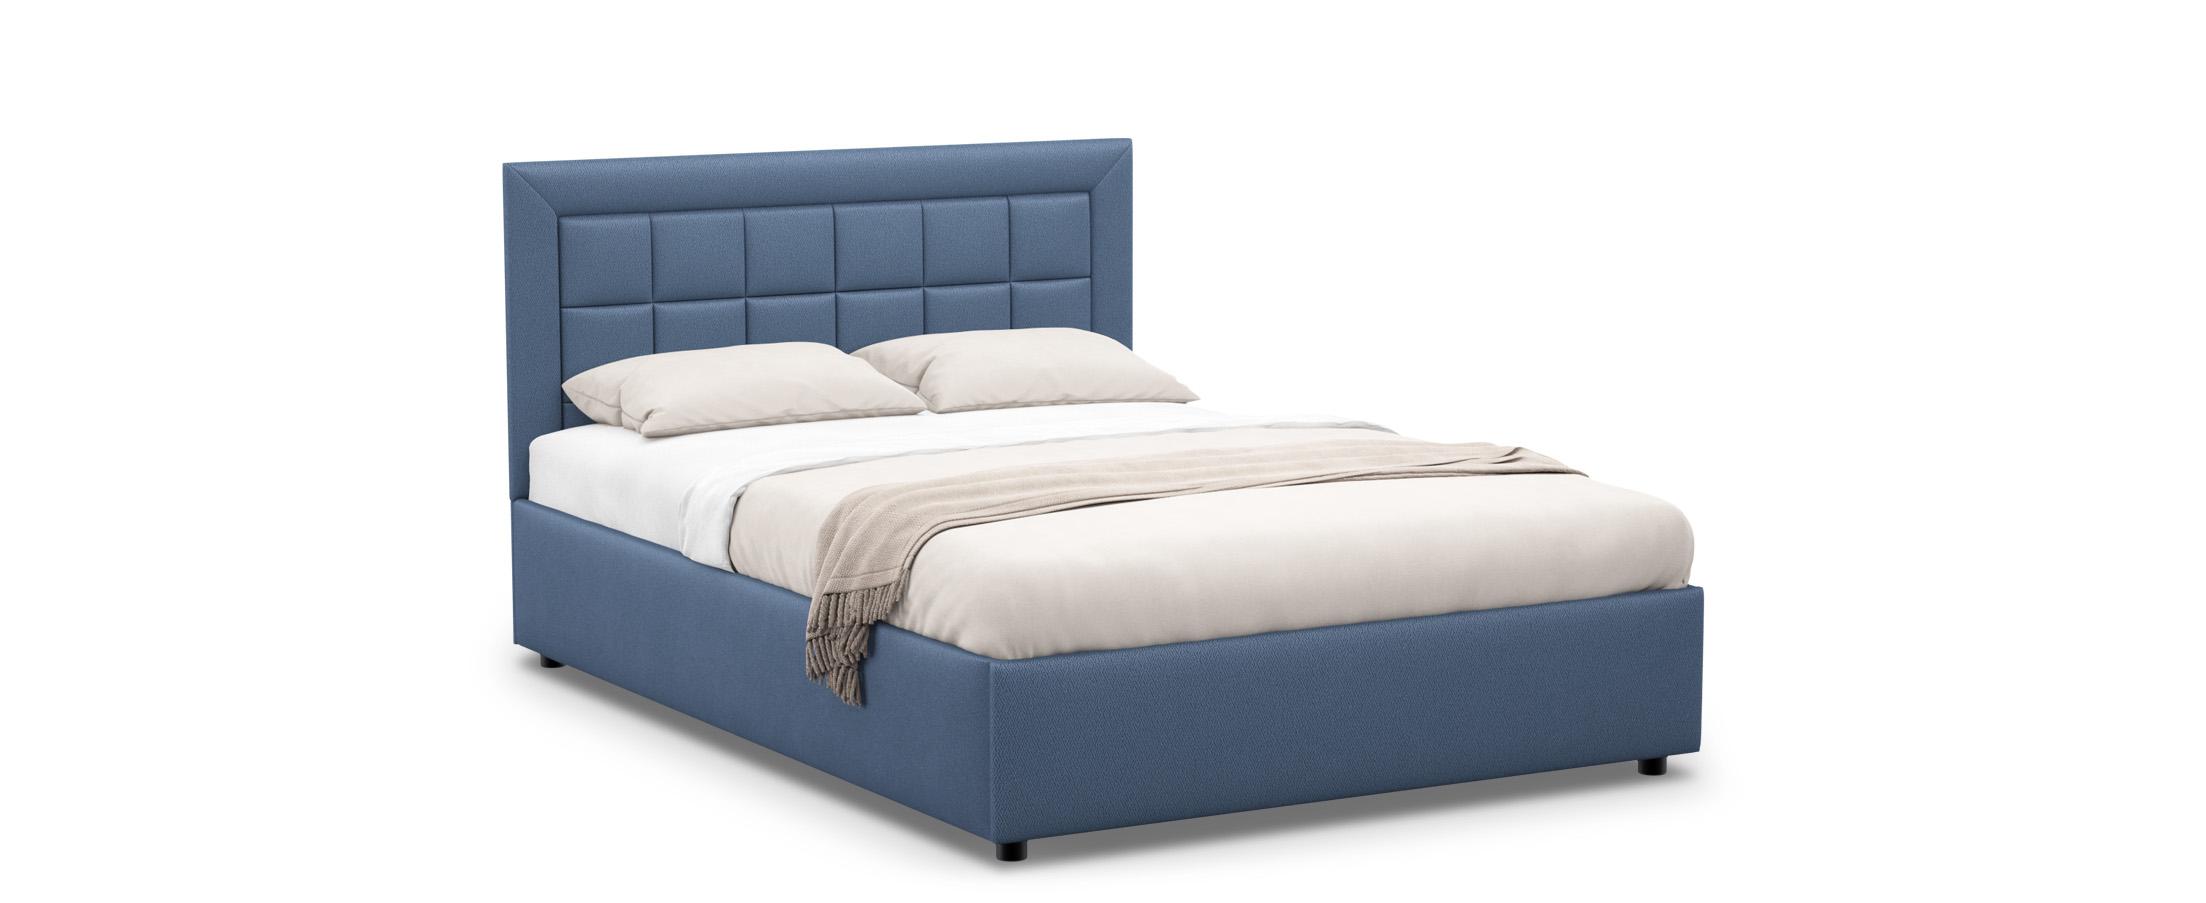 Кровать двуспальная Noemi New 140х200 Модель 1222 фото